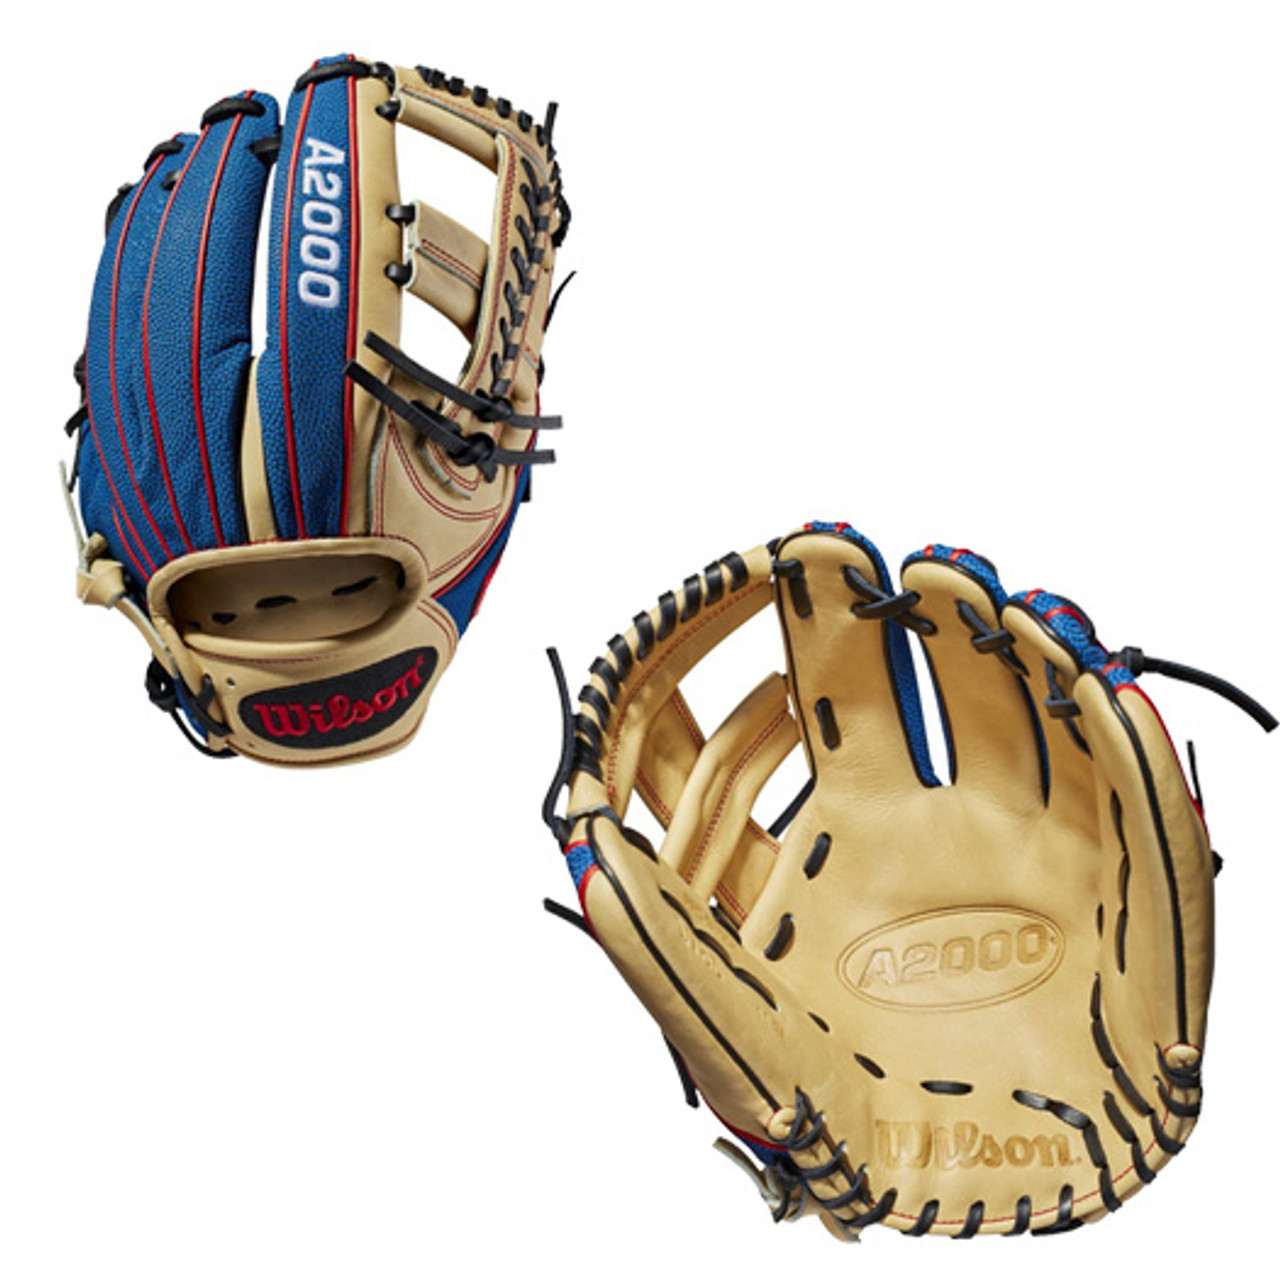 Wilson A2000 SuperSkin 1785 11.75 Baseball Glove